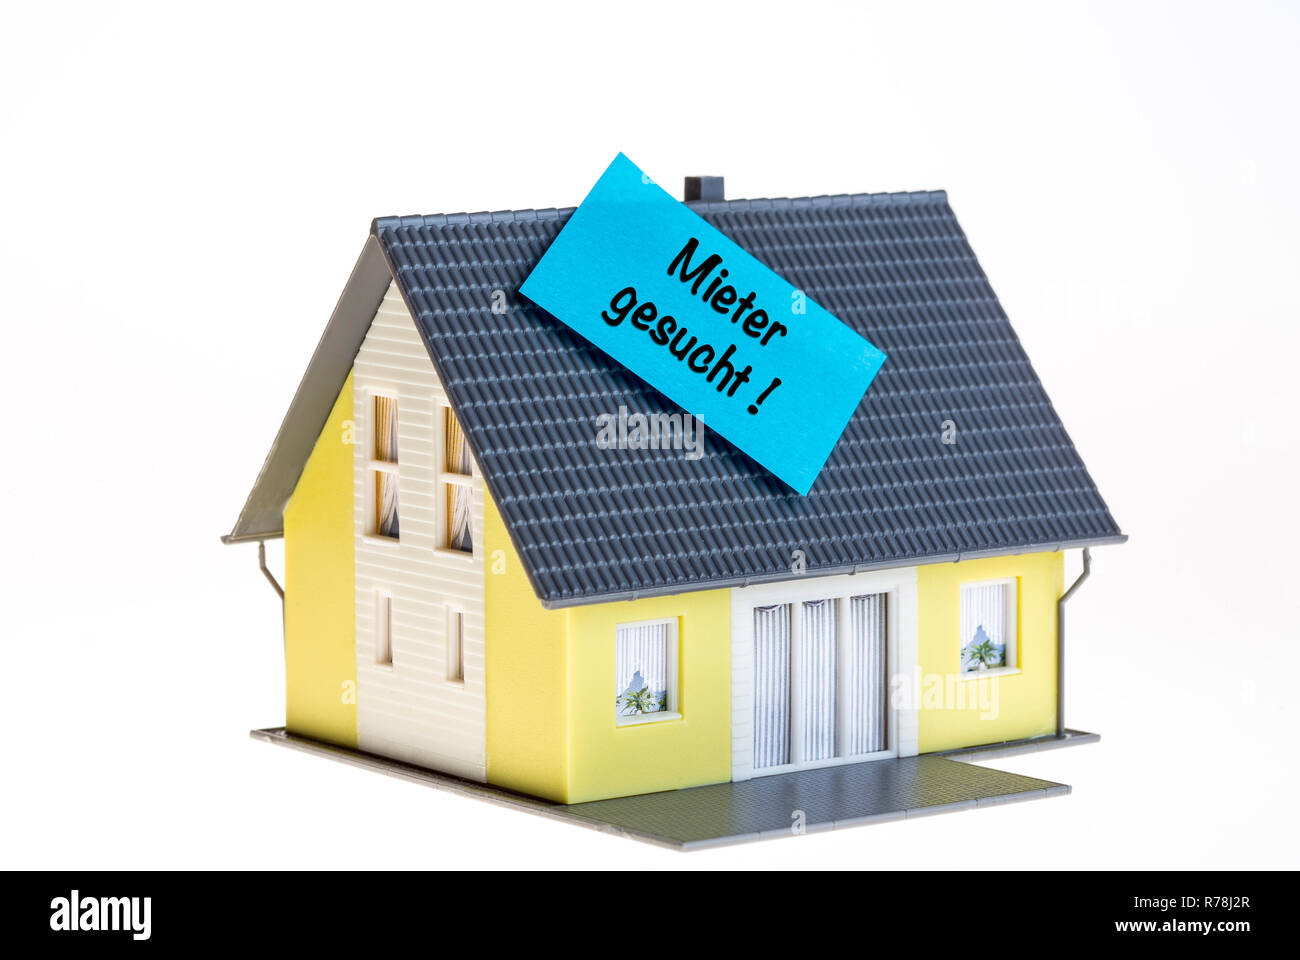 Real estate symbol, looking for tenants, German language - Stock Image